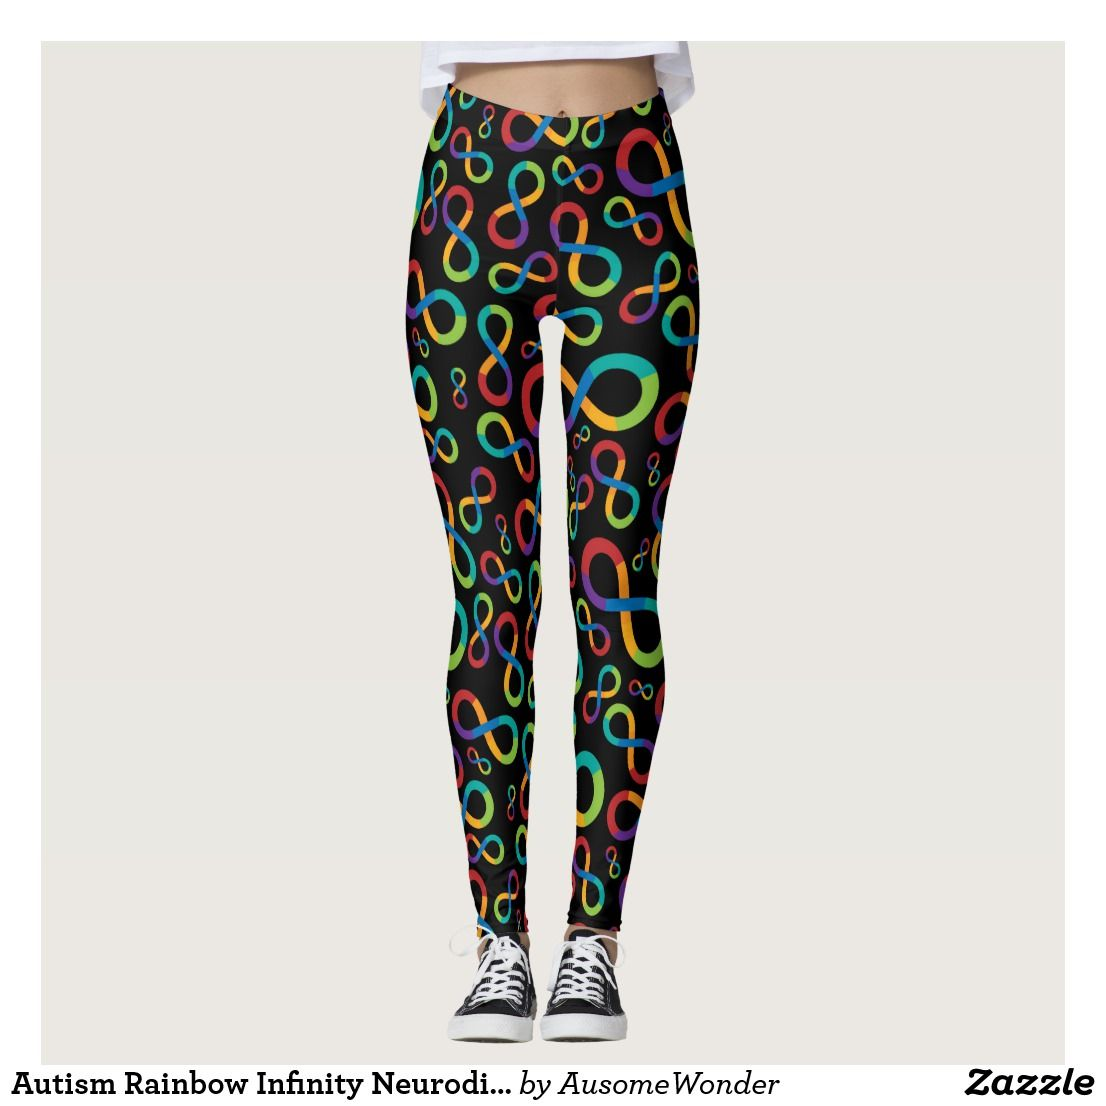 Autism Rainbow Infinity Neurodiversity Leggings Autism Awareness